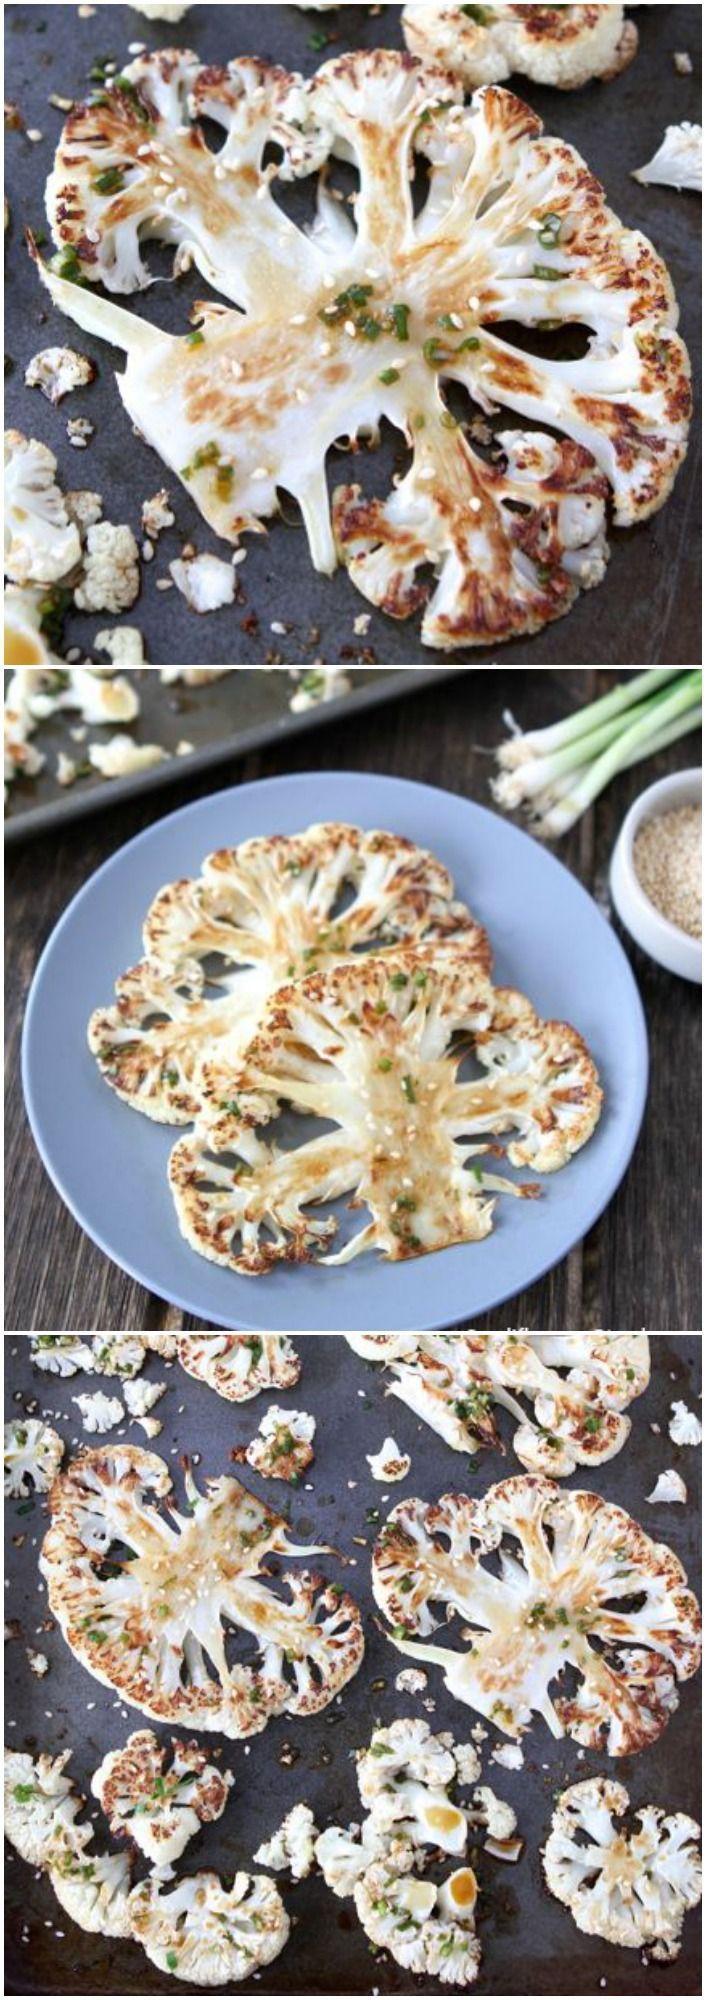 soy sauce cauliflower and potato in cream sauce roasted cauliflower ...